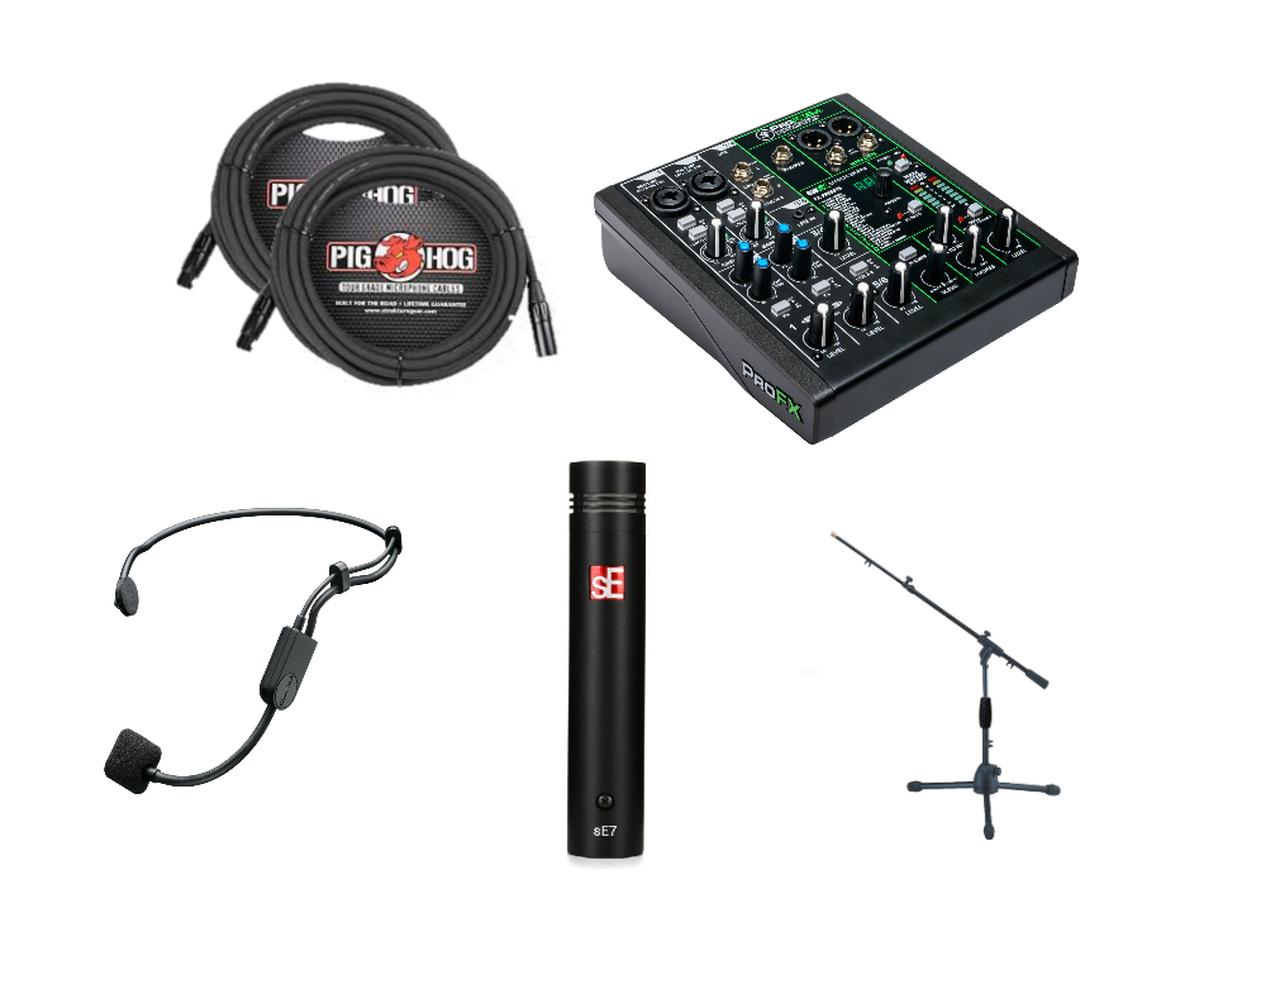 smallest-electronics-option-mackie-se8-wireless-63040.1613418416.png